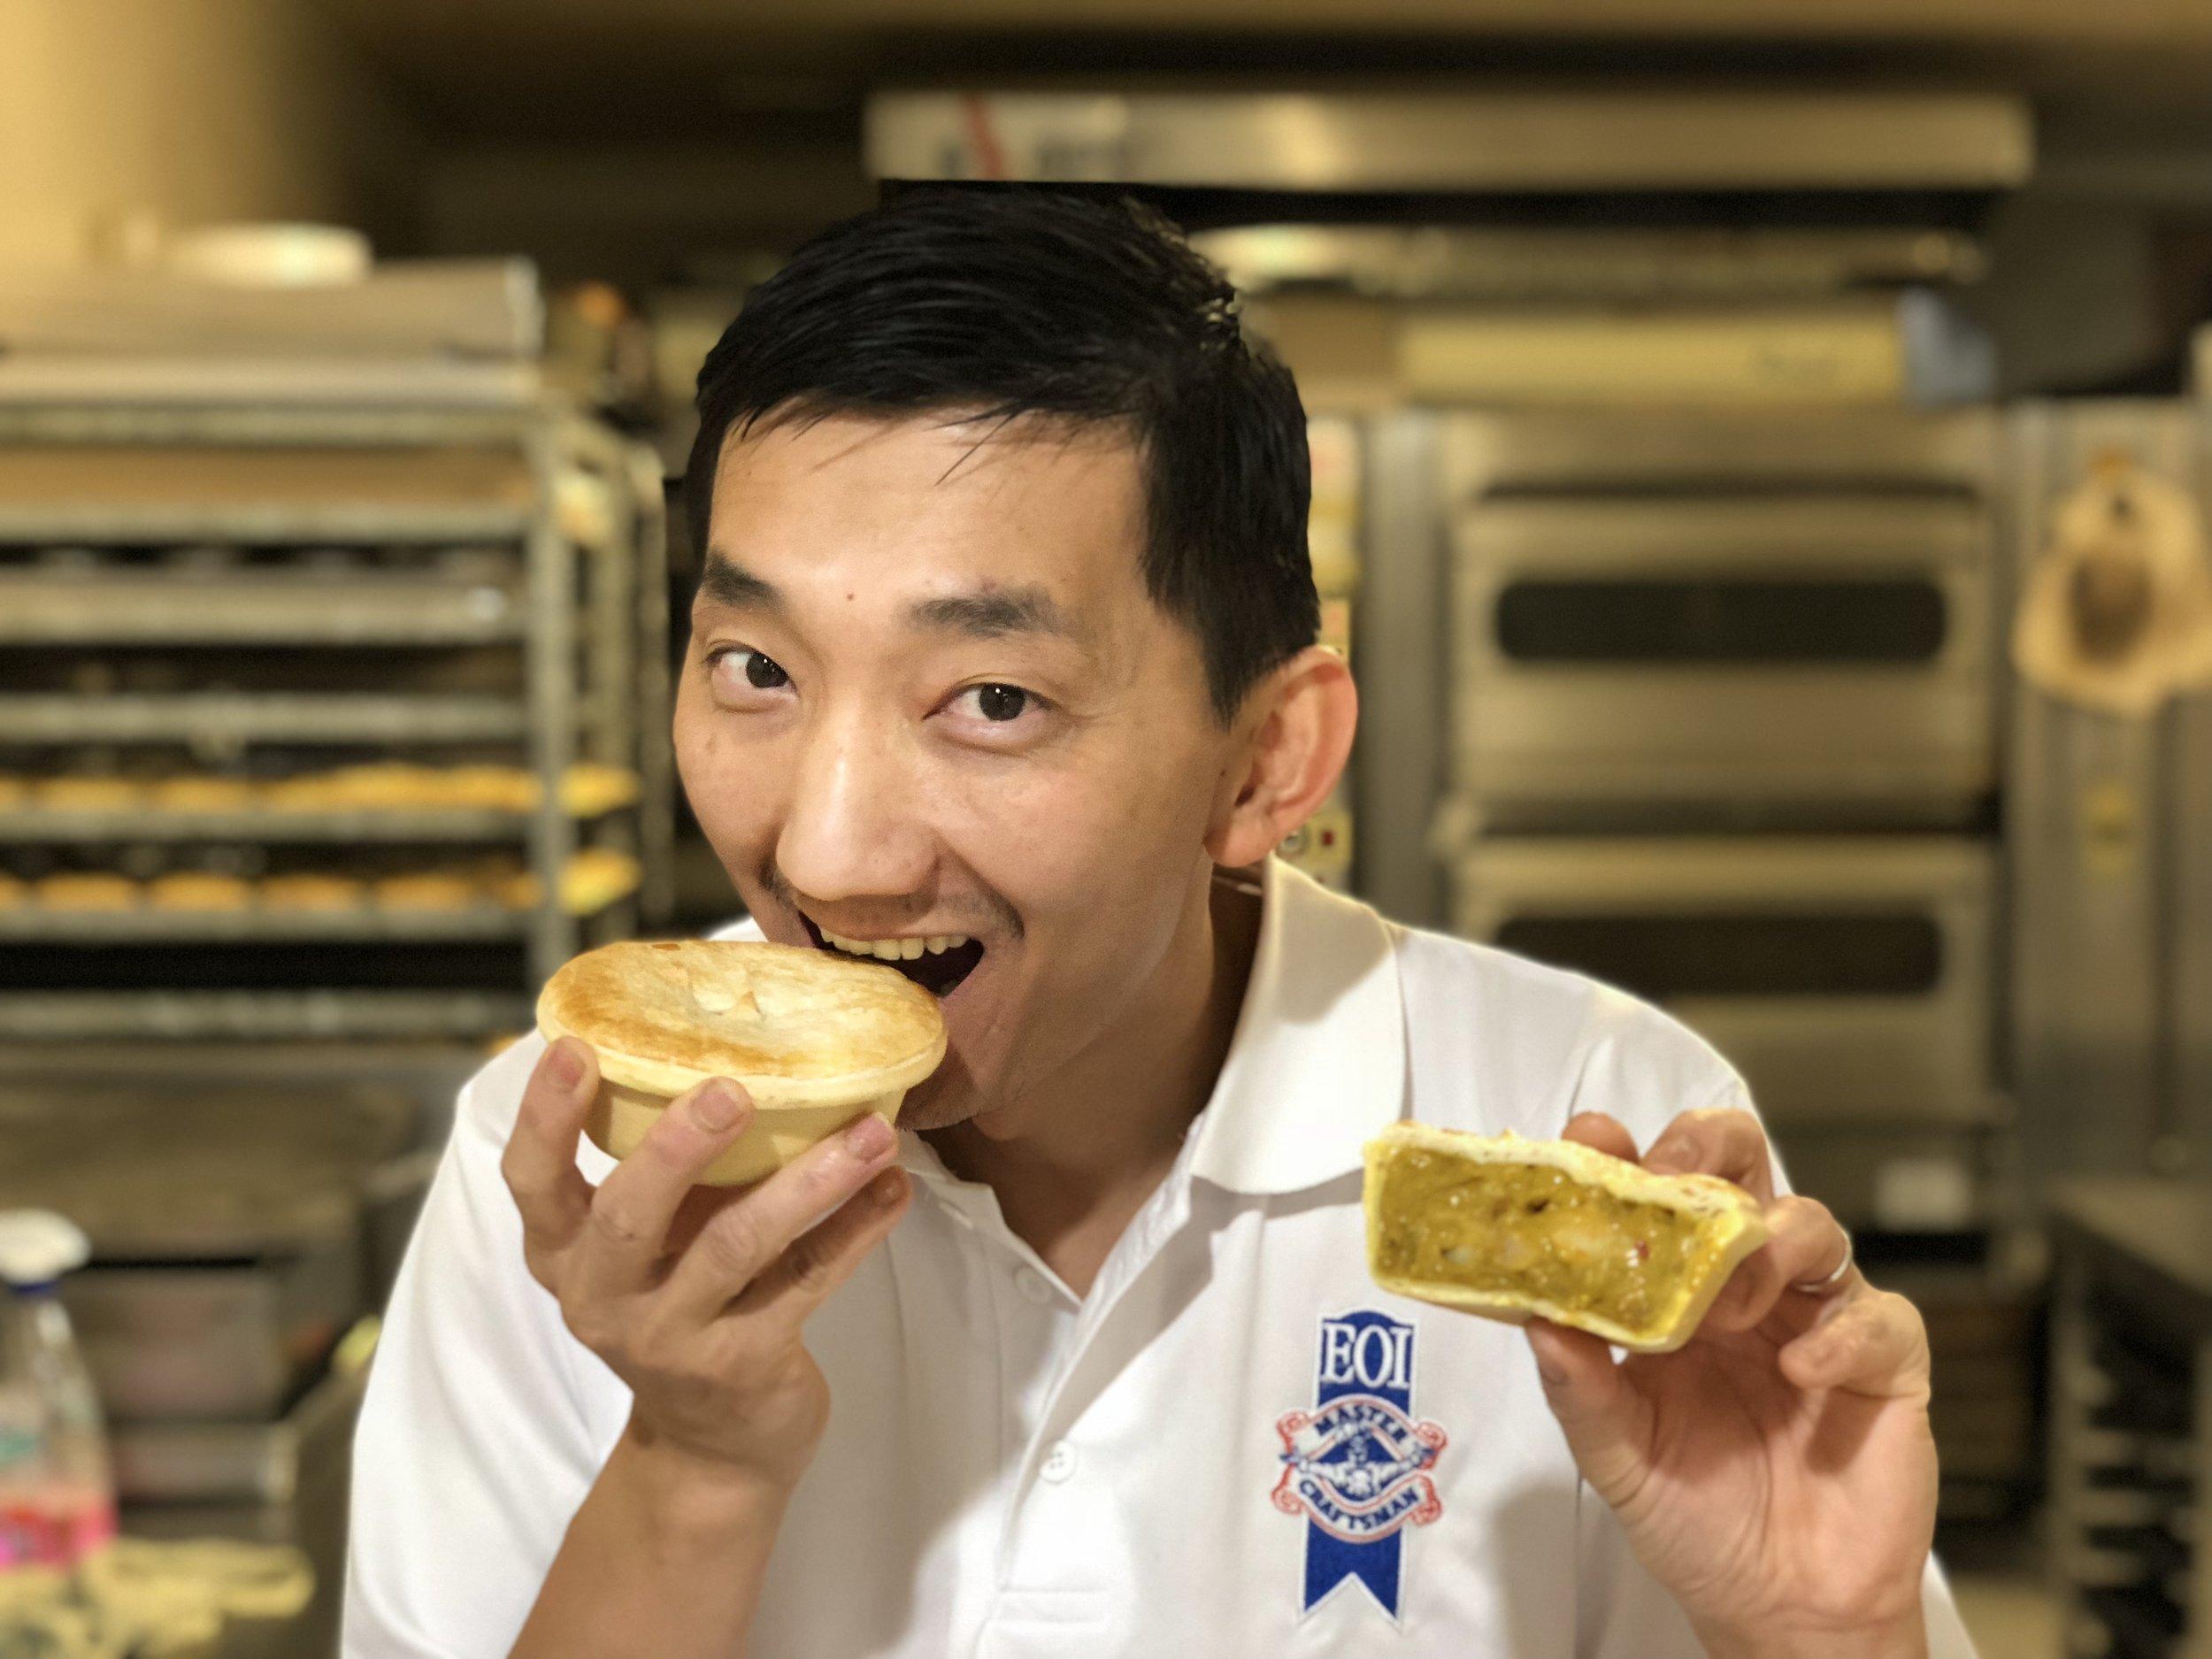 2018 Pie winner, Chan Khun, owner of Country Cobb Bakery in Kyneton, Victoria